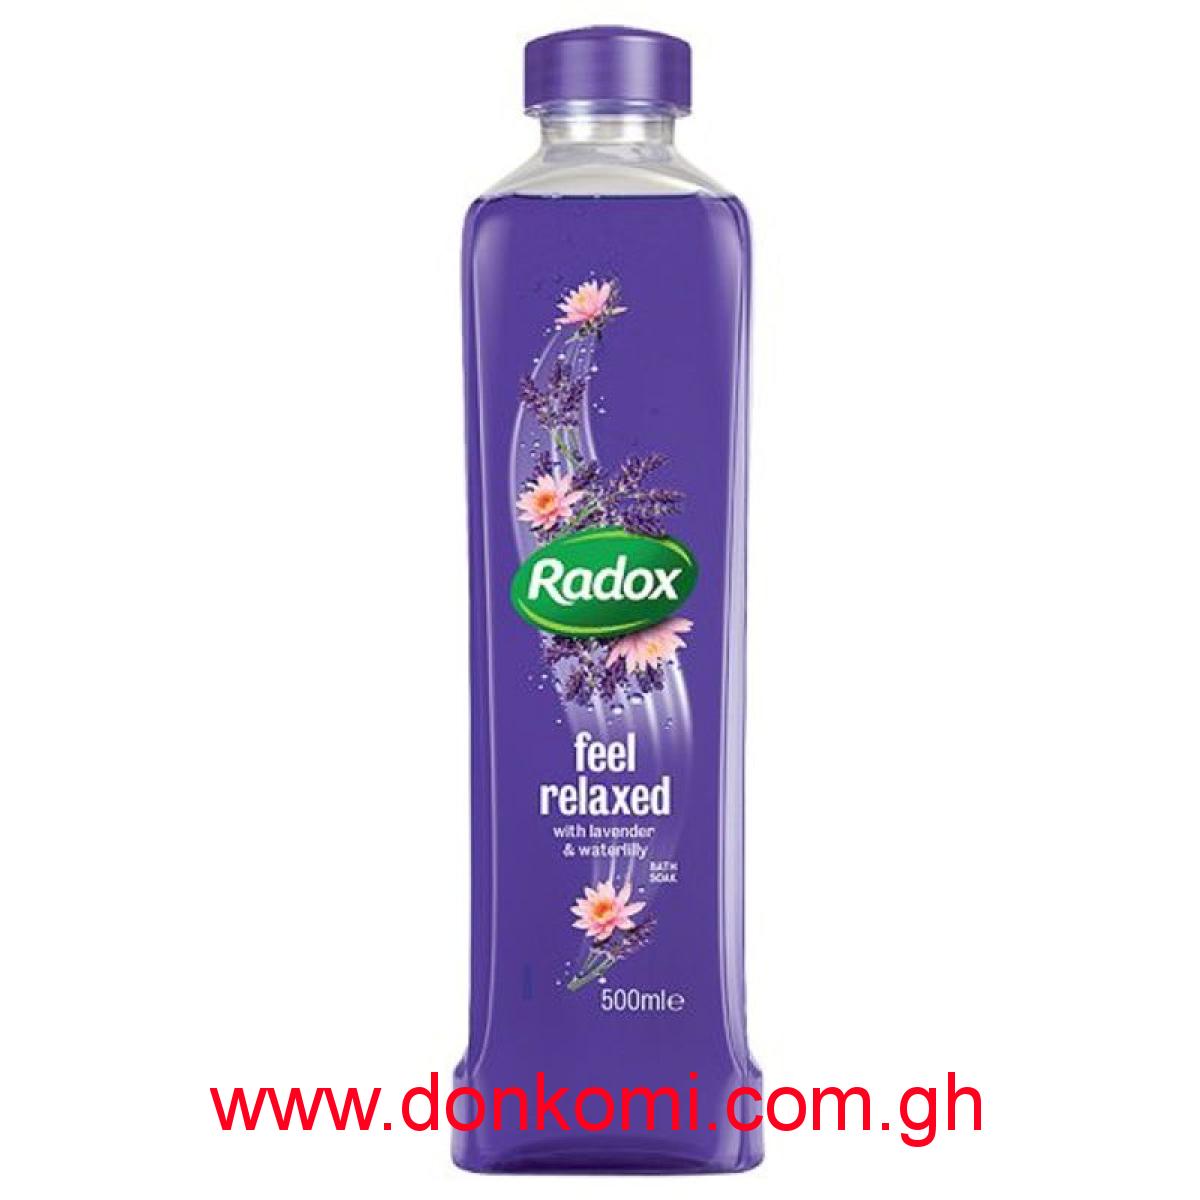 RADOX SHOWER GEL